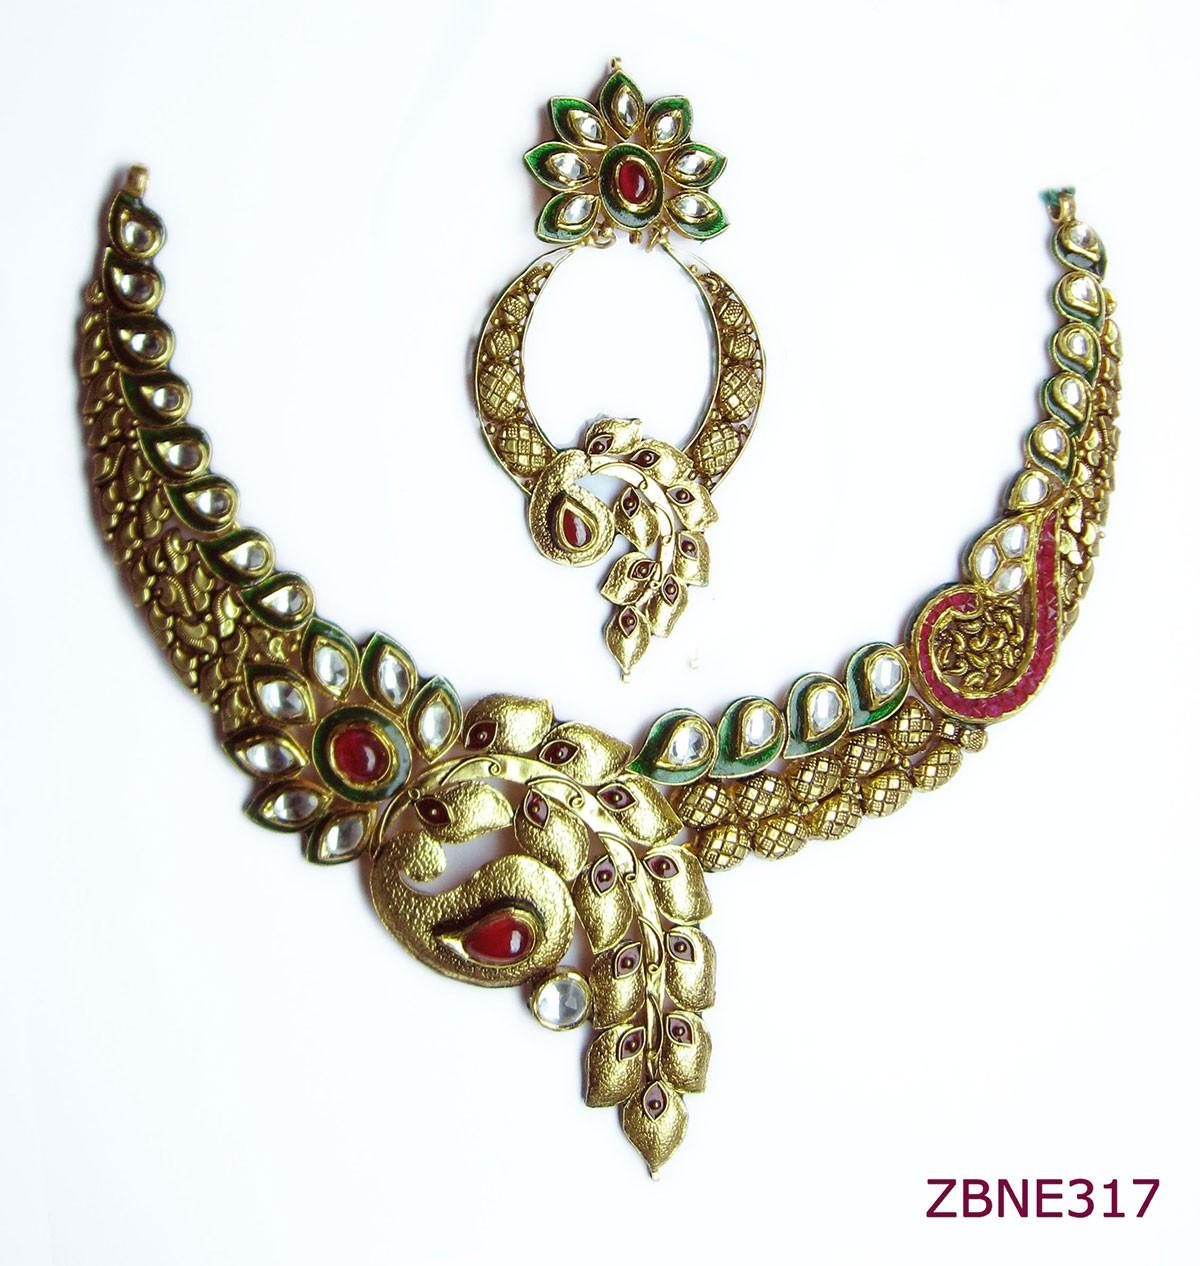 ZBNE317